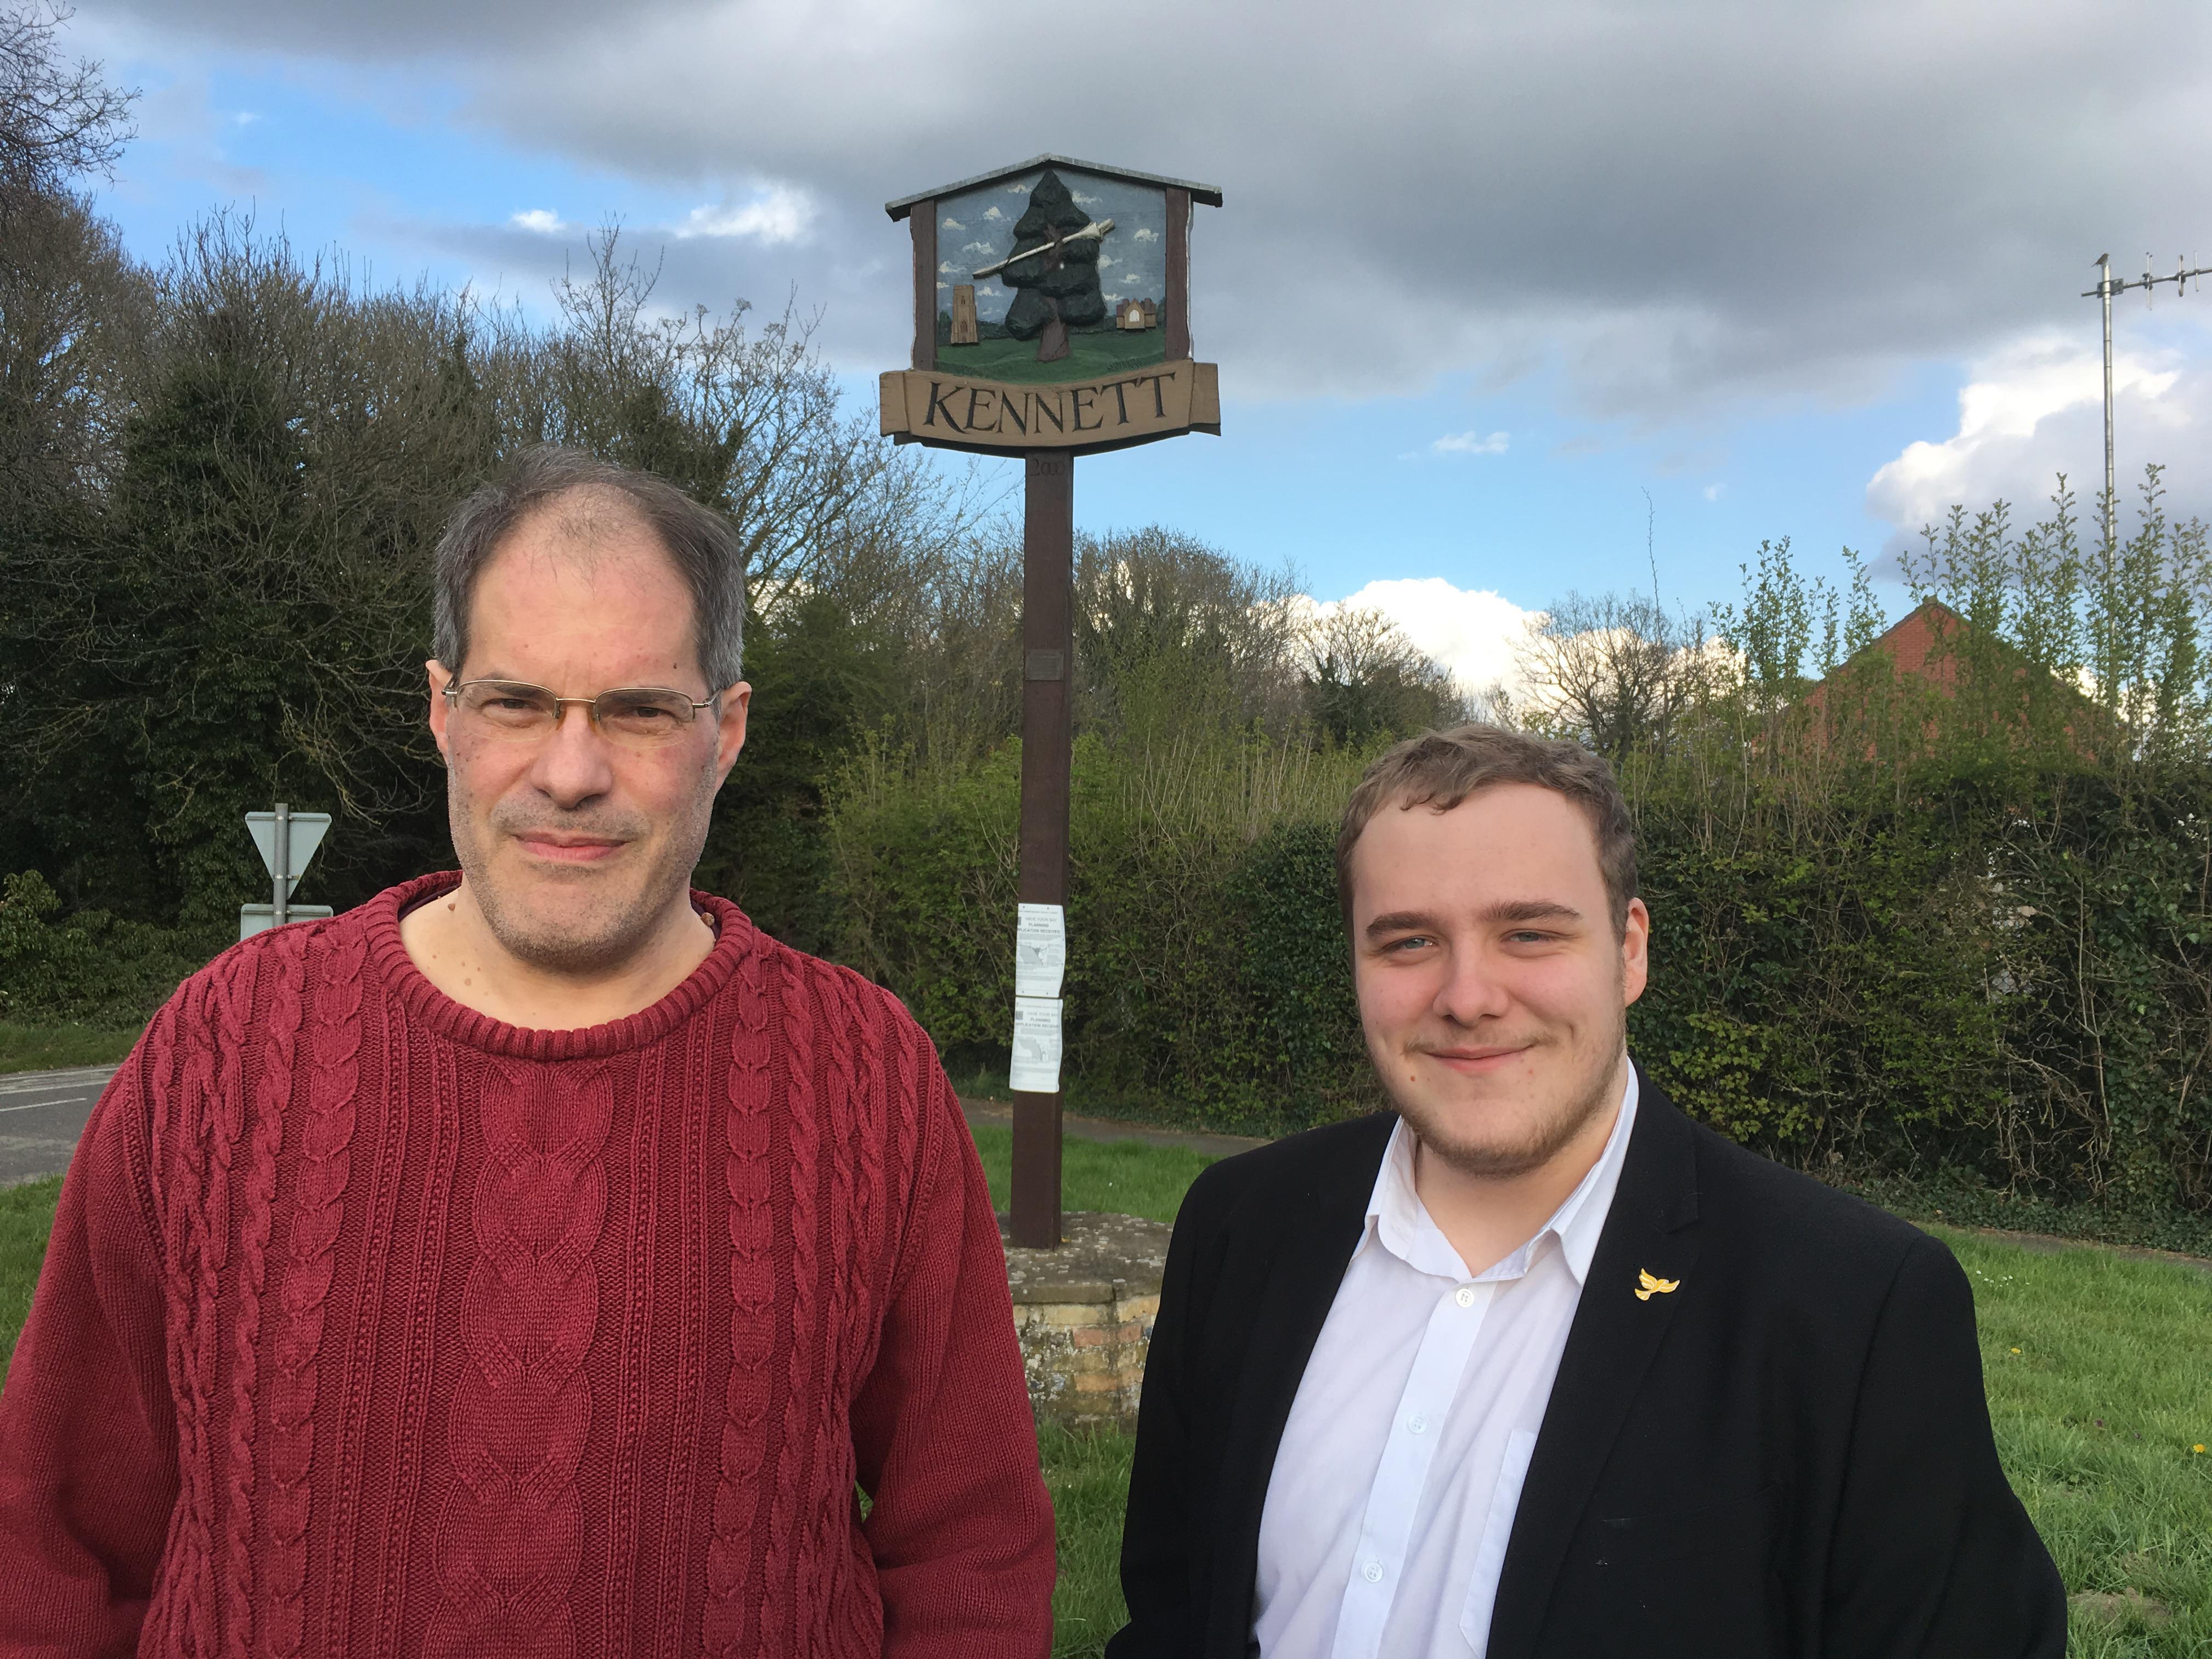 Connor Docwra and Rupert Moss-Eccardt - Lib Dem Candidates for Fordham & Isleham